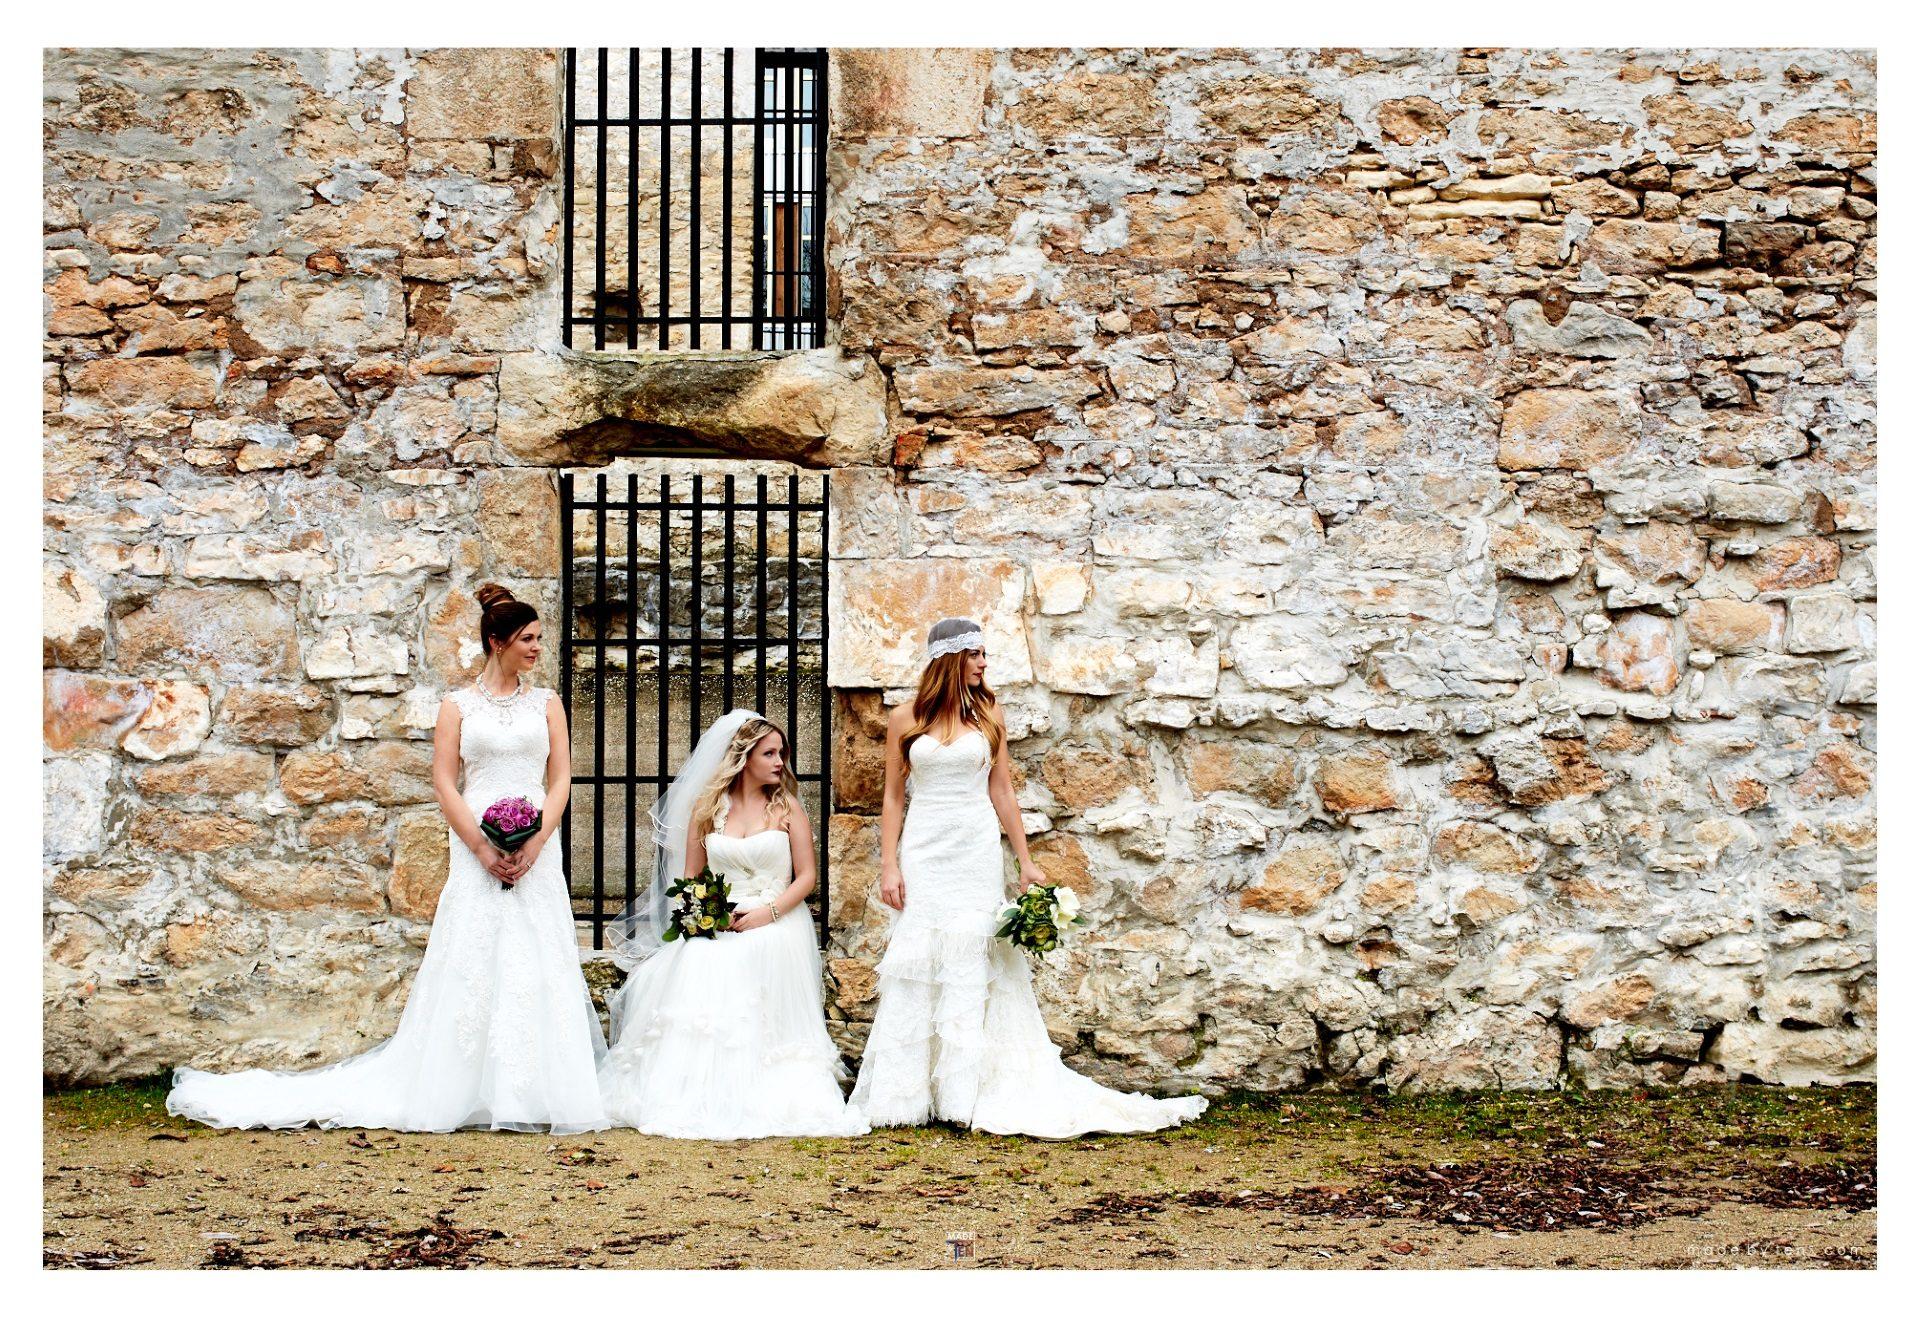 Beautiful Wedding Dresses Ruins - GTA Women Bridal Photography